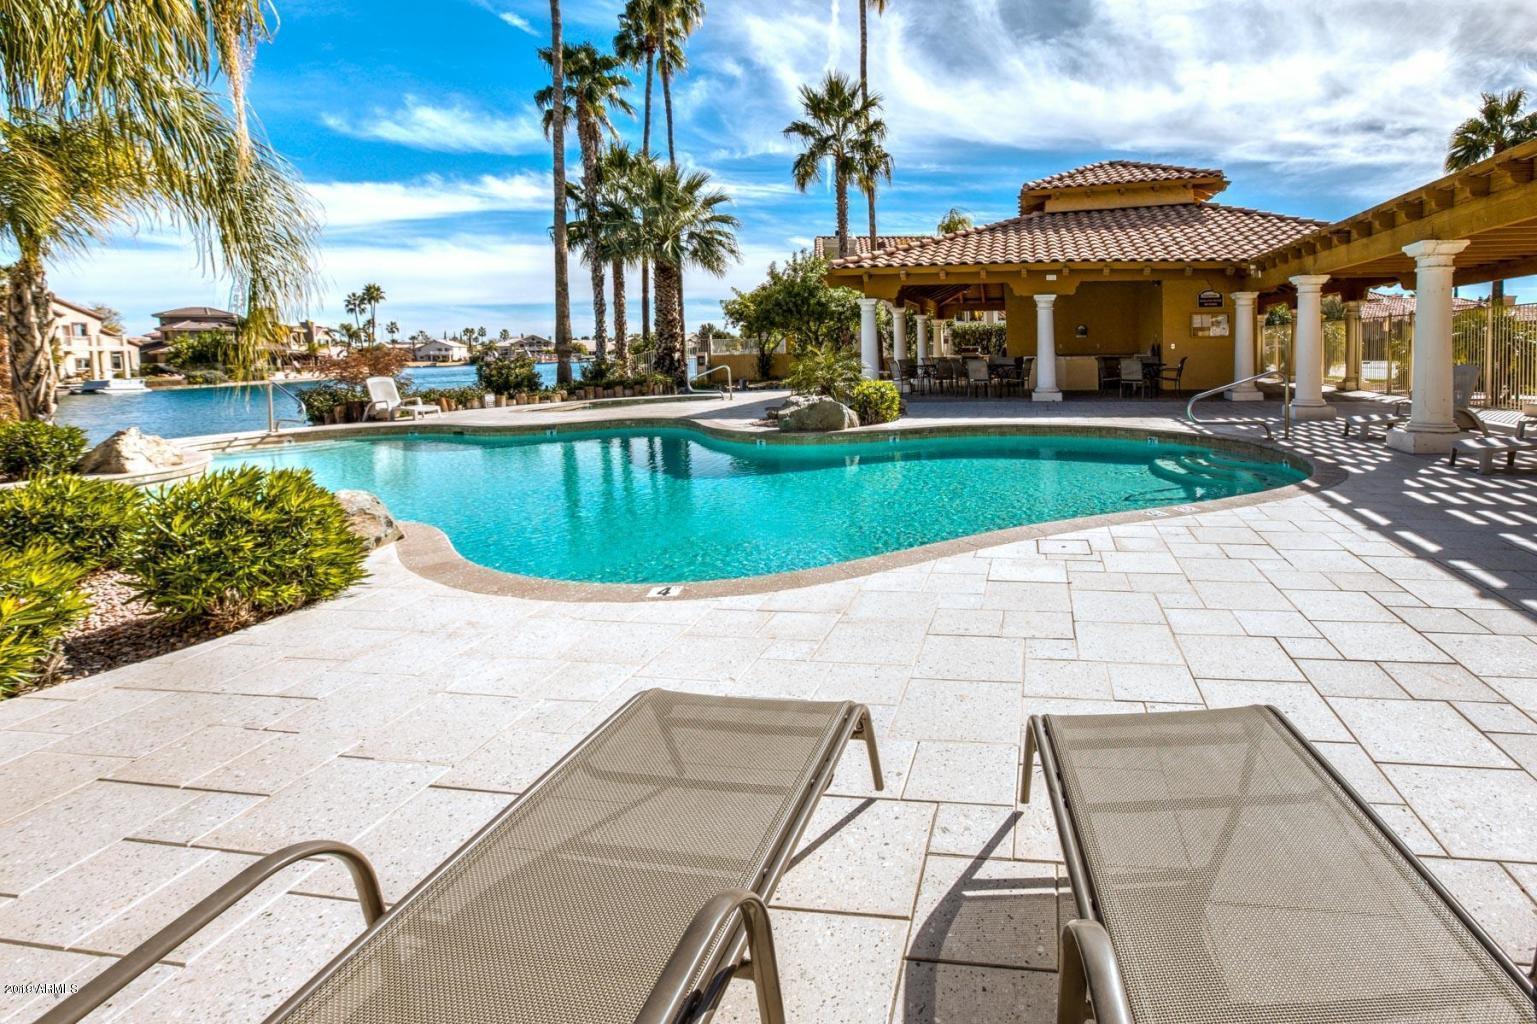 MLS 5932313 449 S MARINA Drive, Gilbert, AZ 85233 Condos